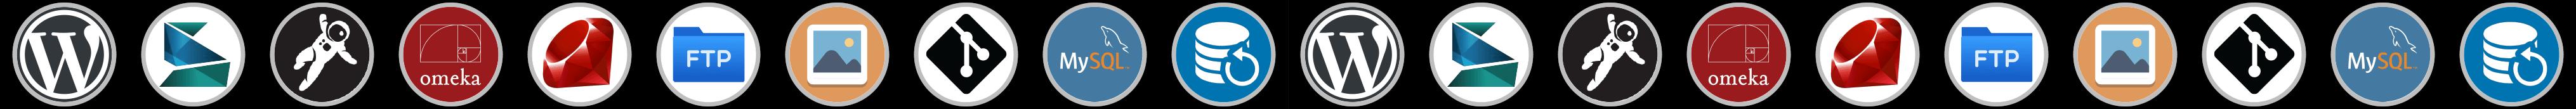 service icons